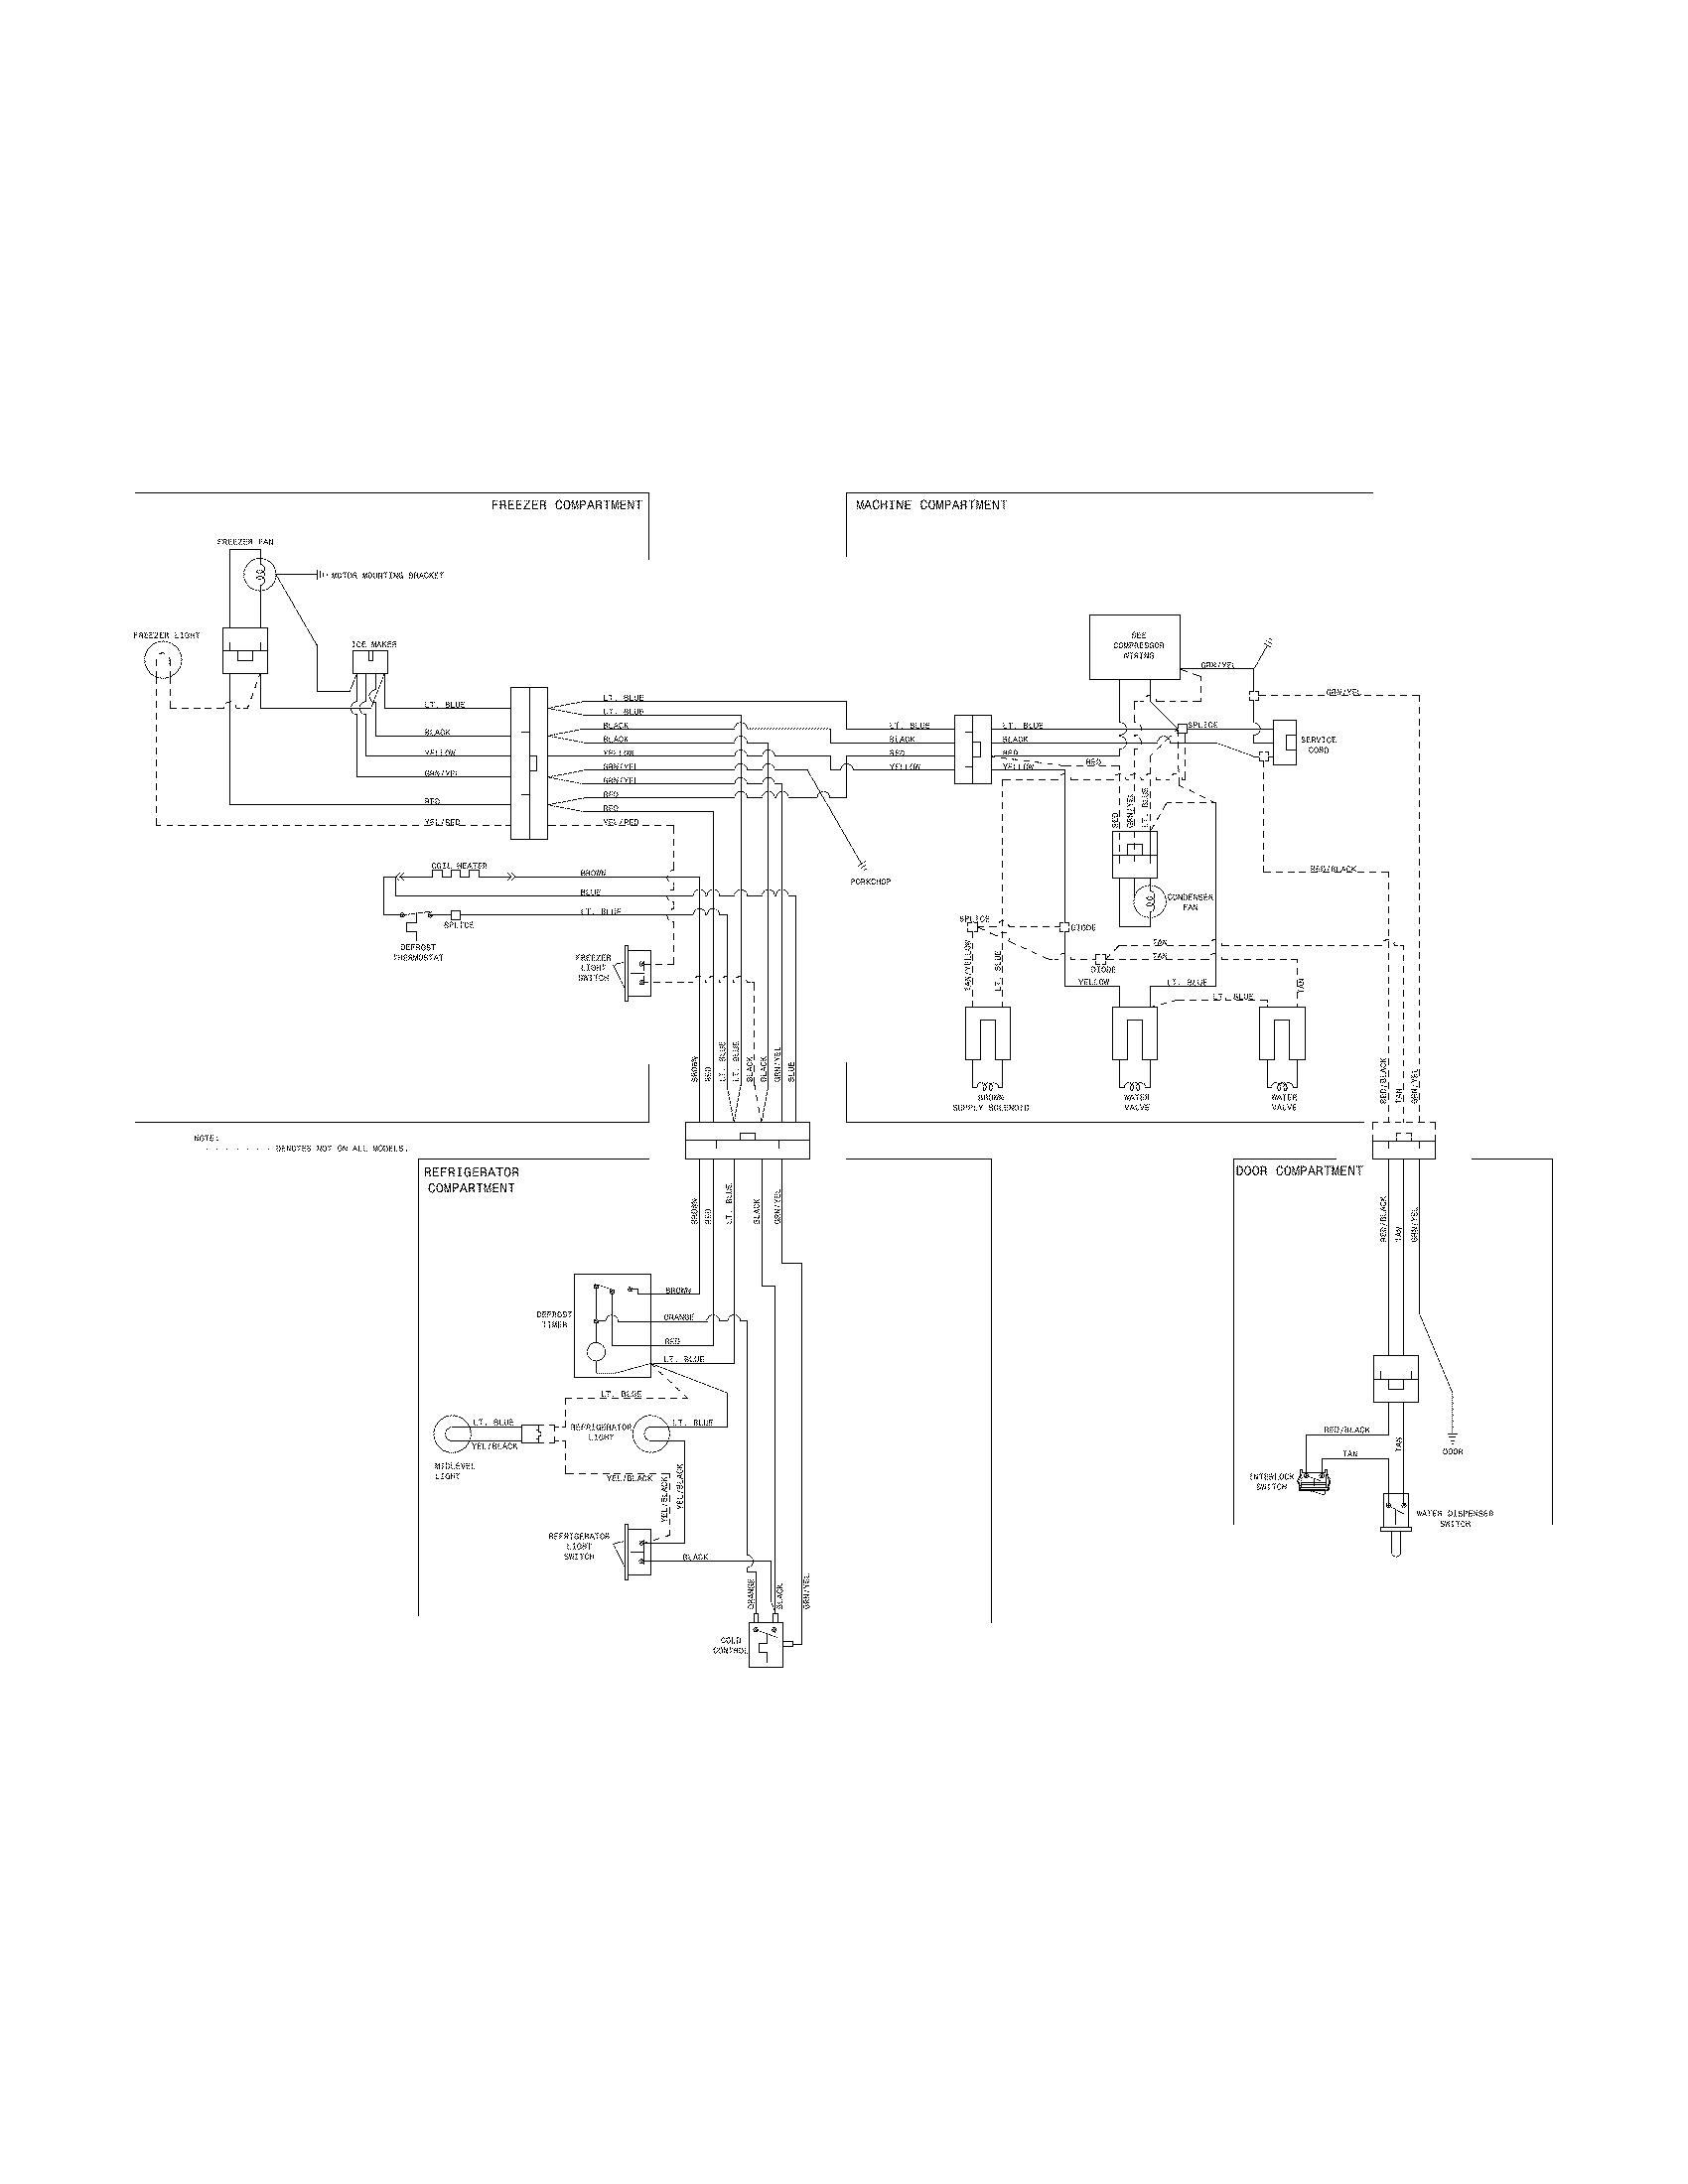 Frigidaire model FFHI1817LB0 top-mount refrigerator